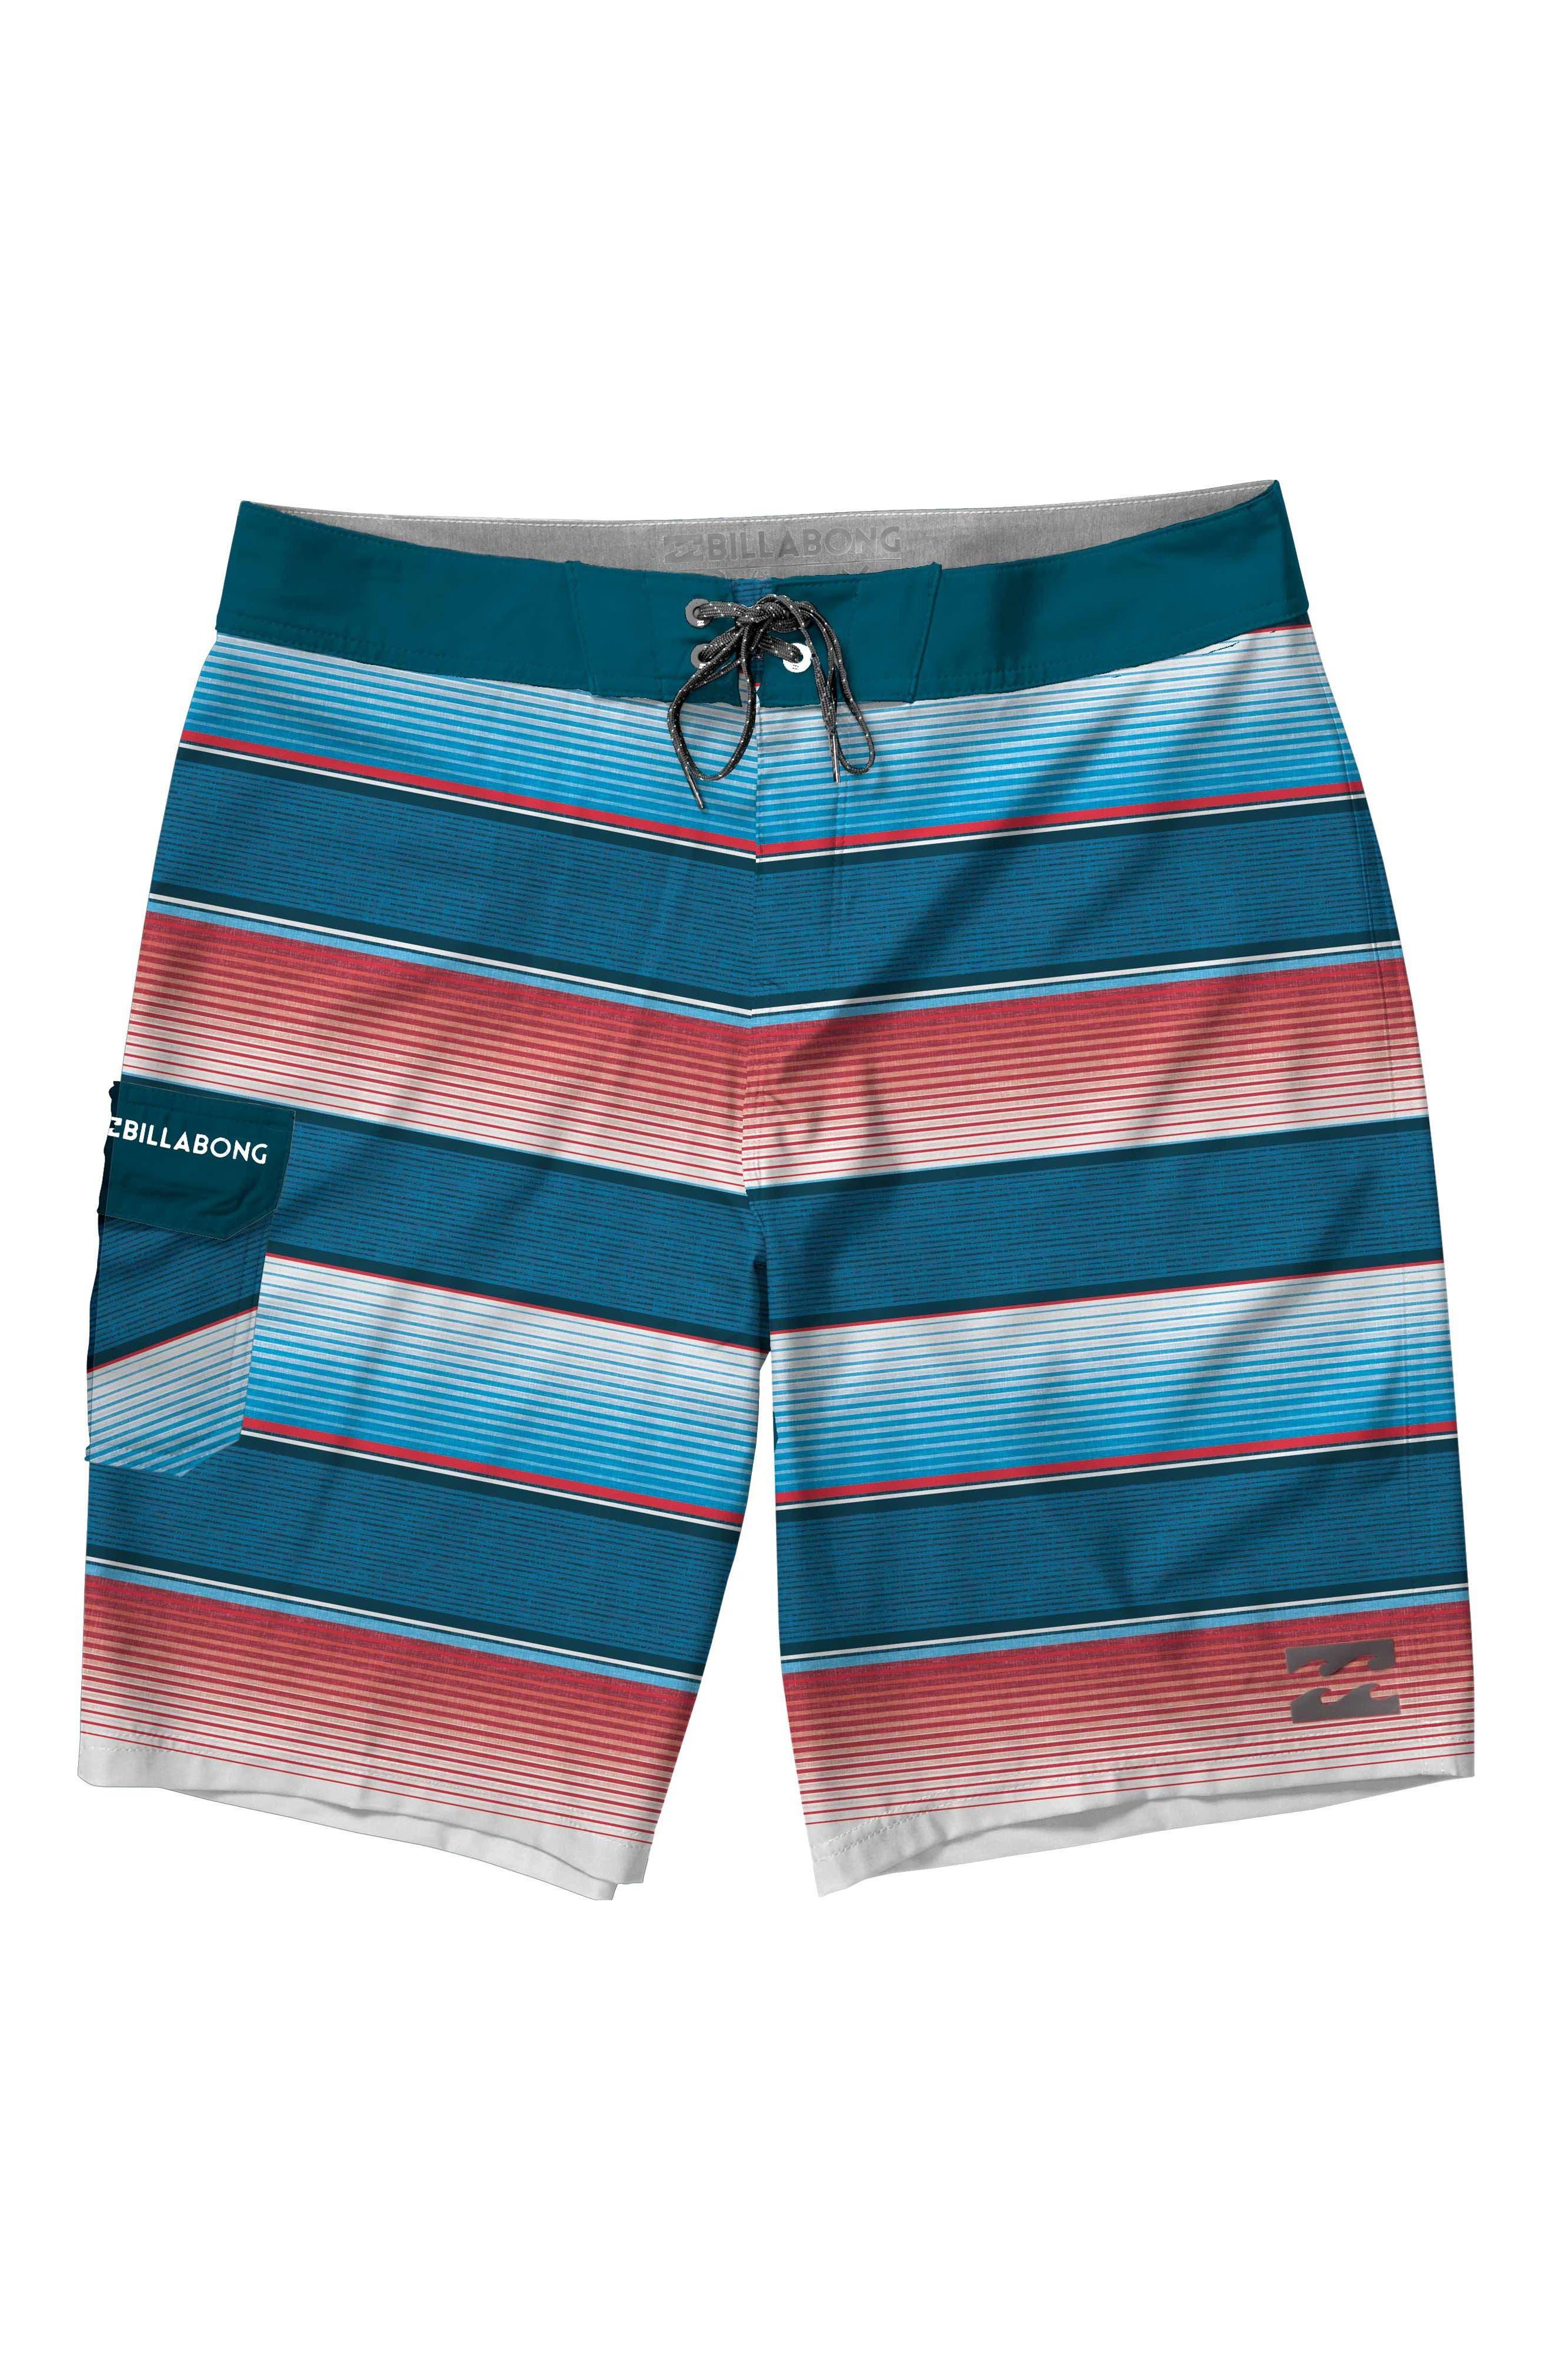 Billabong All Day Stripe Board Shorts (Toddler Boys & Little Boys)